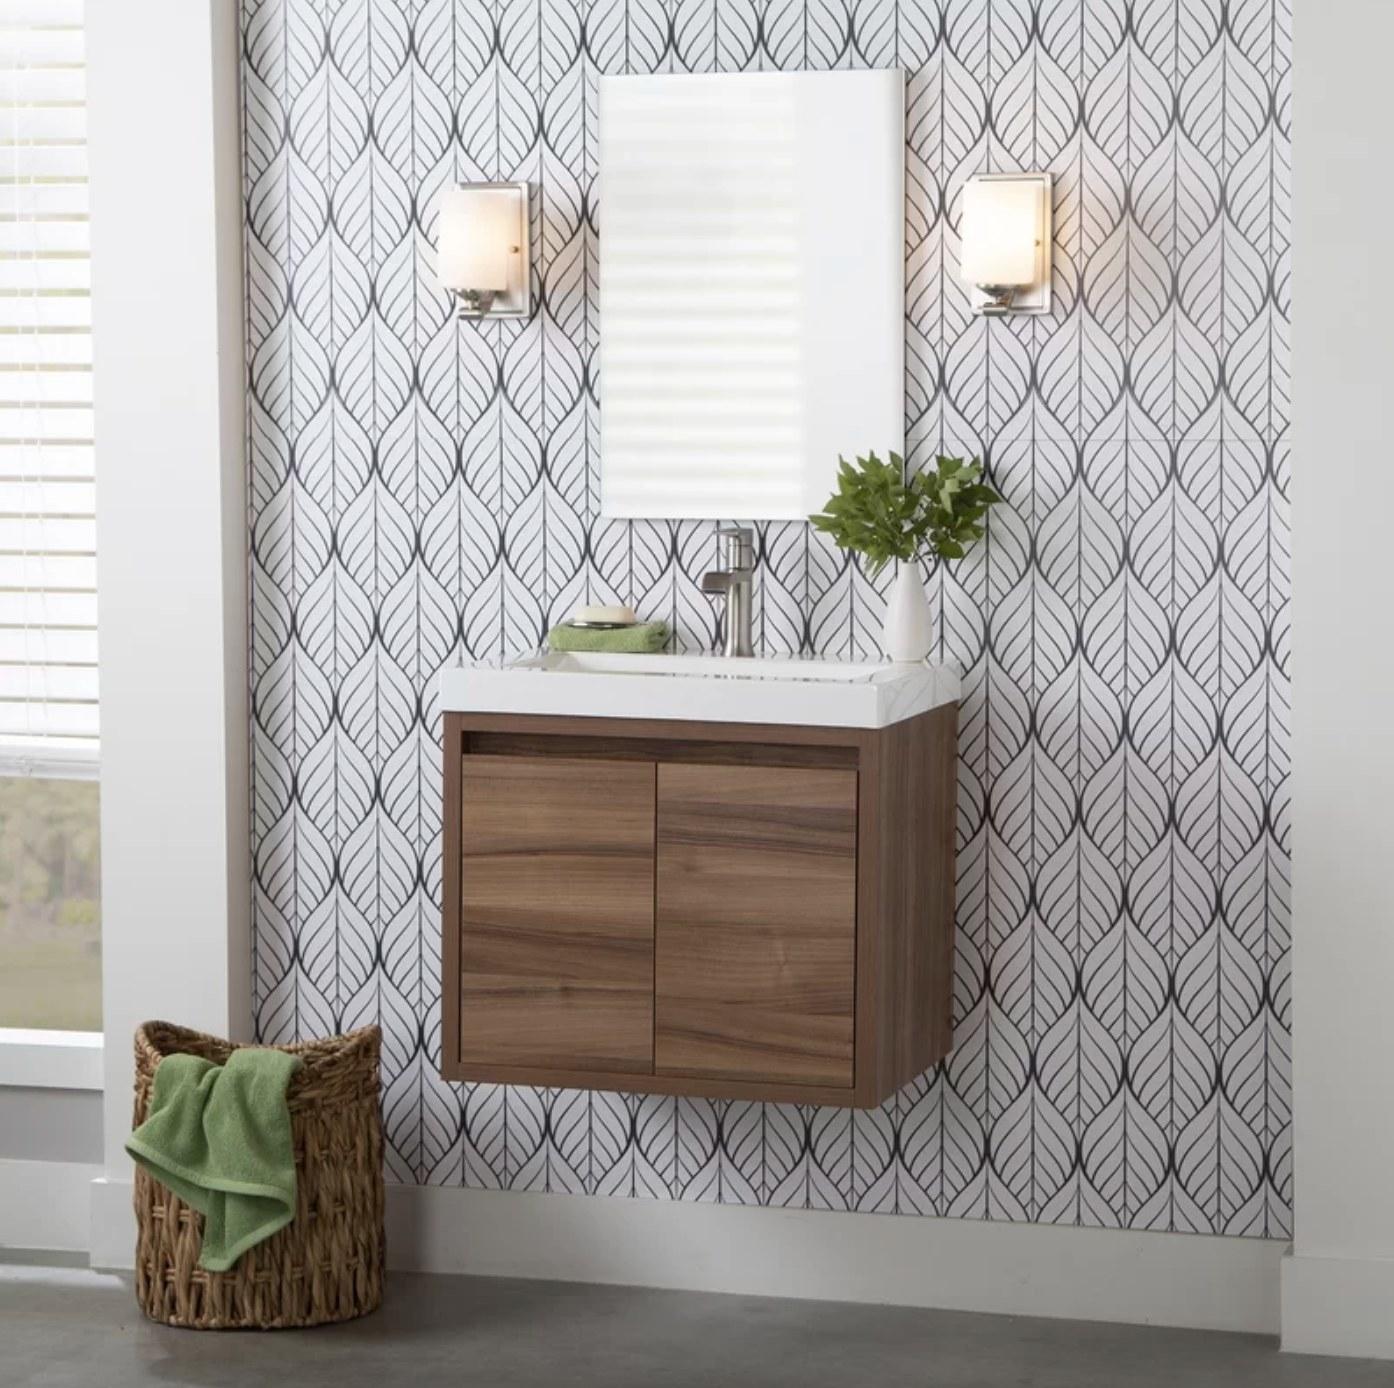 The wall mount single vanity bathroom set in caramel